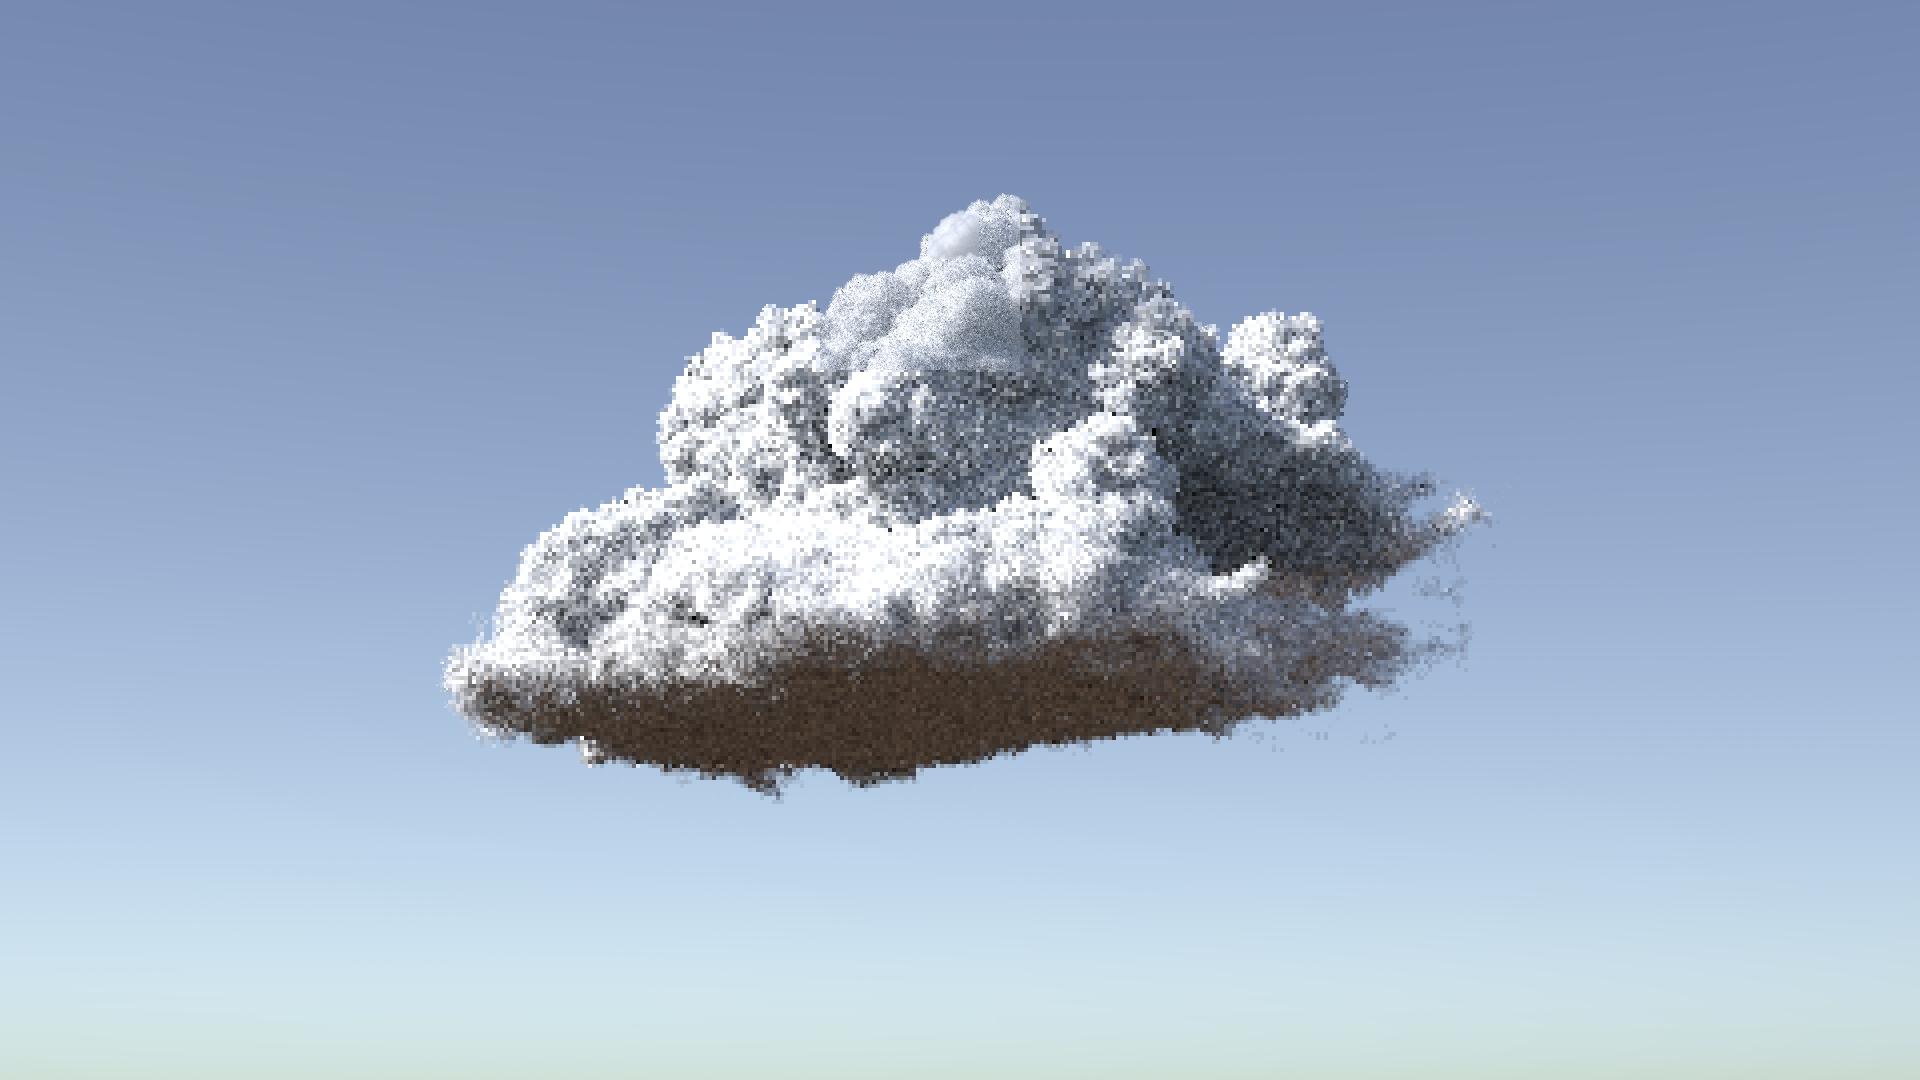 Dense cloud shader (wdas cloud hype) - Shaders - od forum